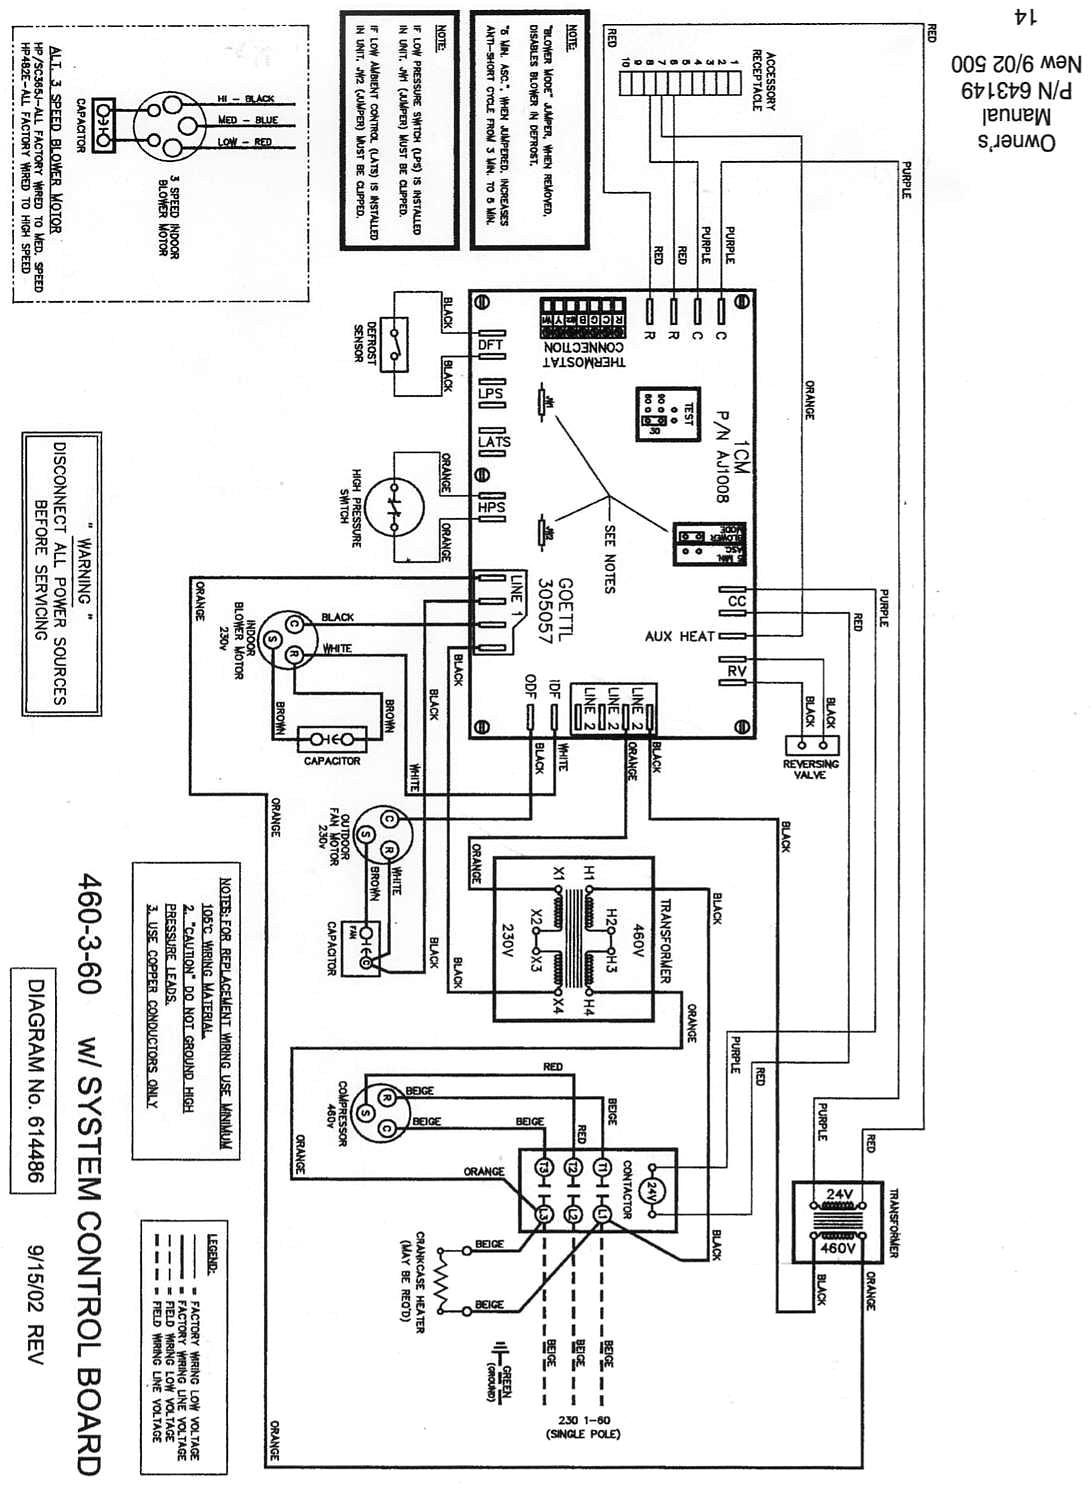 Goodman ac wiring diagram wiring diagram image wiring diagram trane heat pump electrical goodman entrancing a asfbconference2016 Choice Image